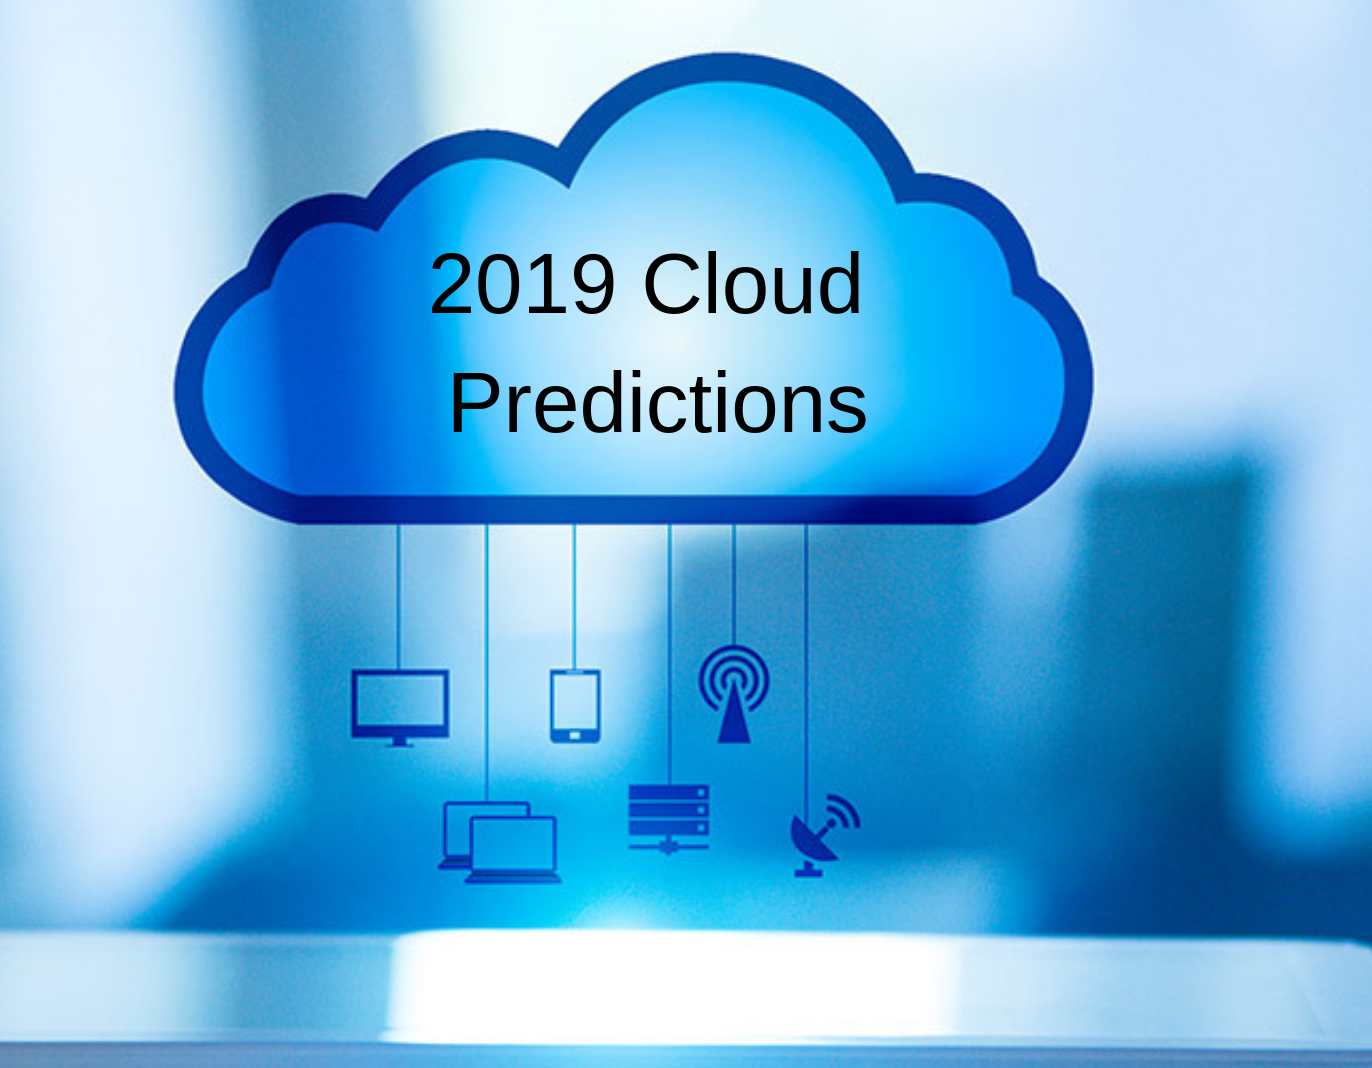 2019 Cloud Industry: Preparing for Enhanced Cloud Operations